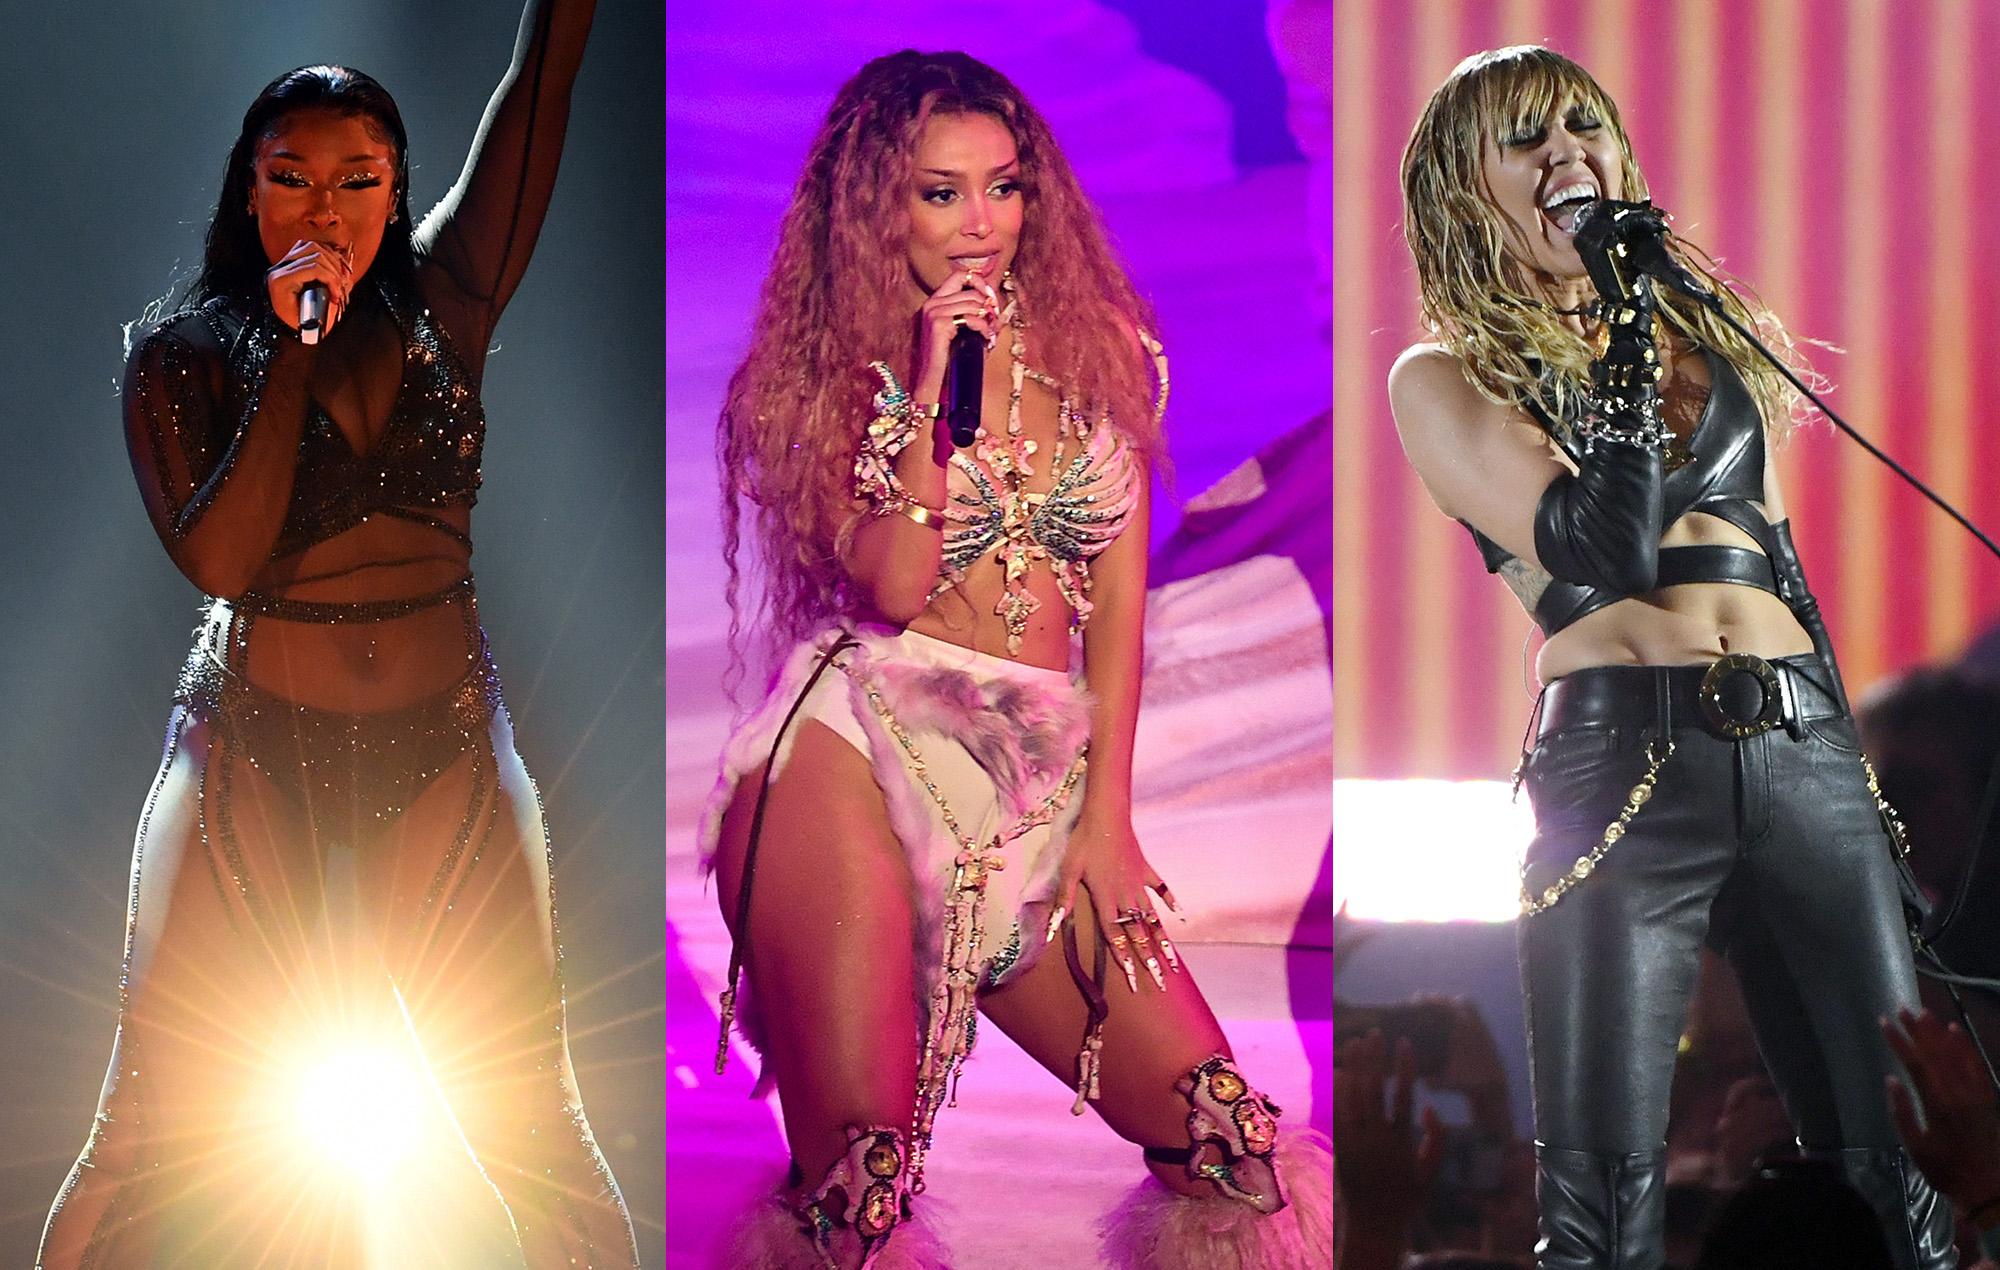 Megan Thee Stallion, Doja Cat, Miley Cyrus announced for 'New Year's Rockin' Eve'